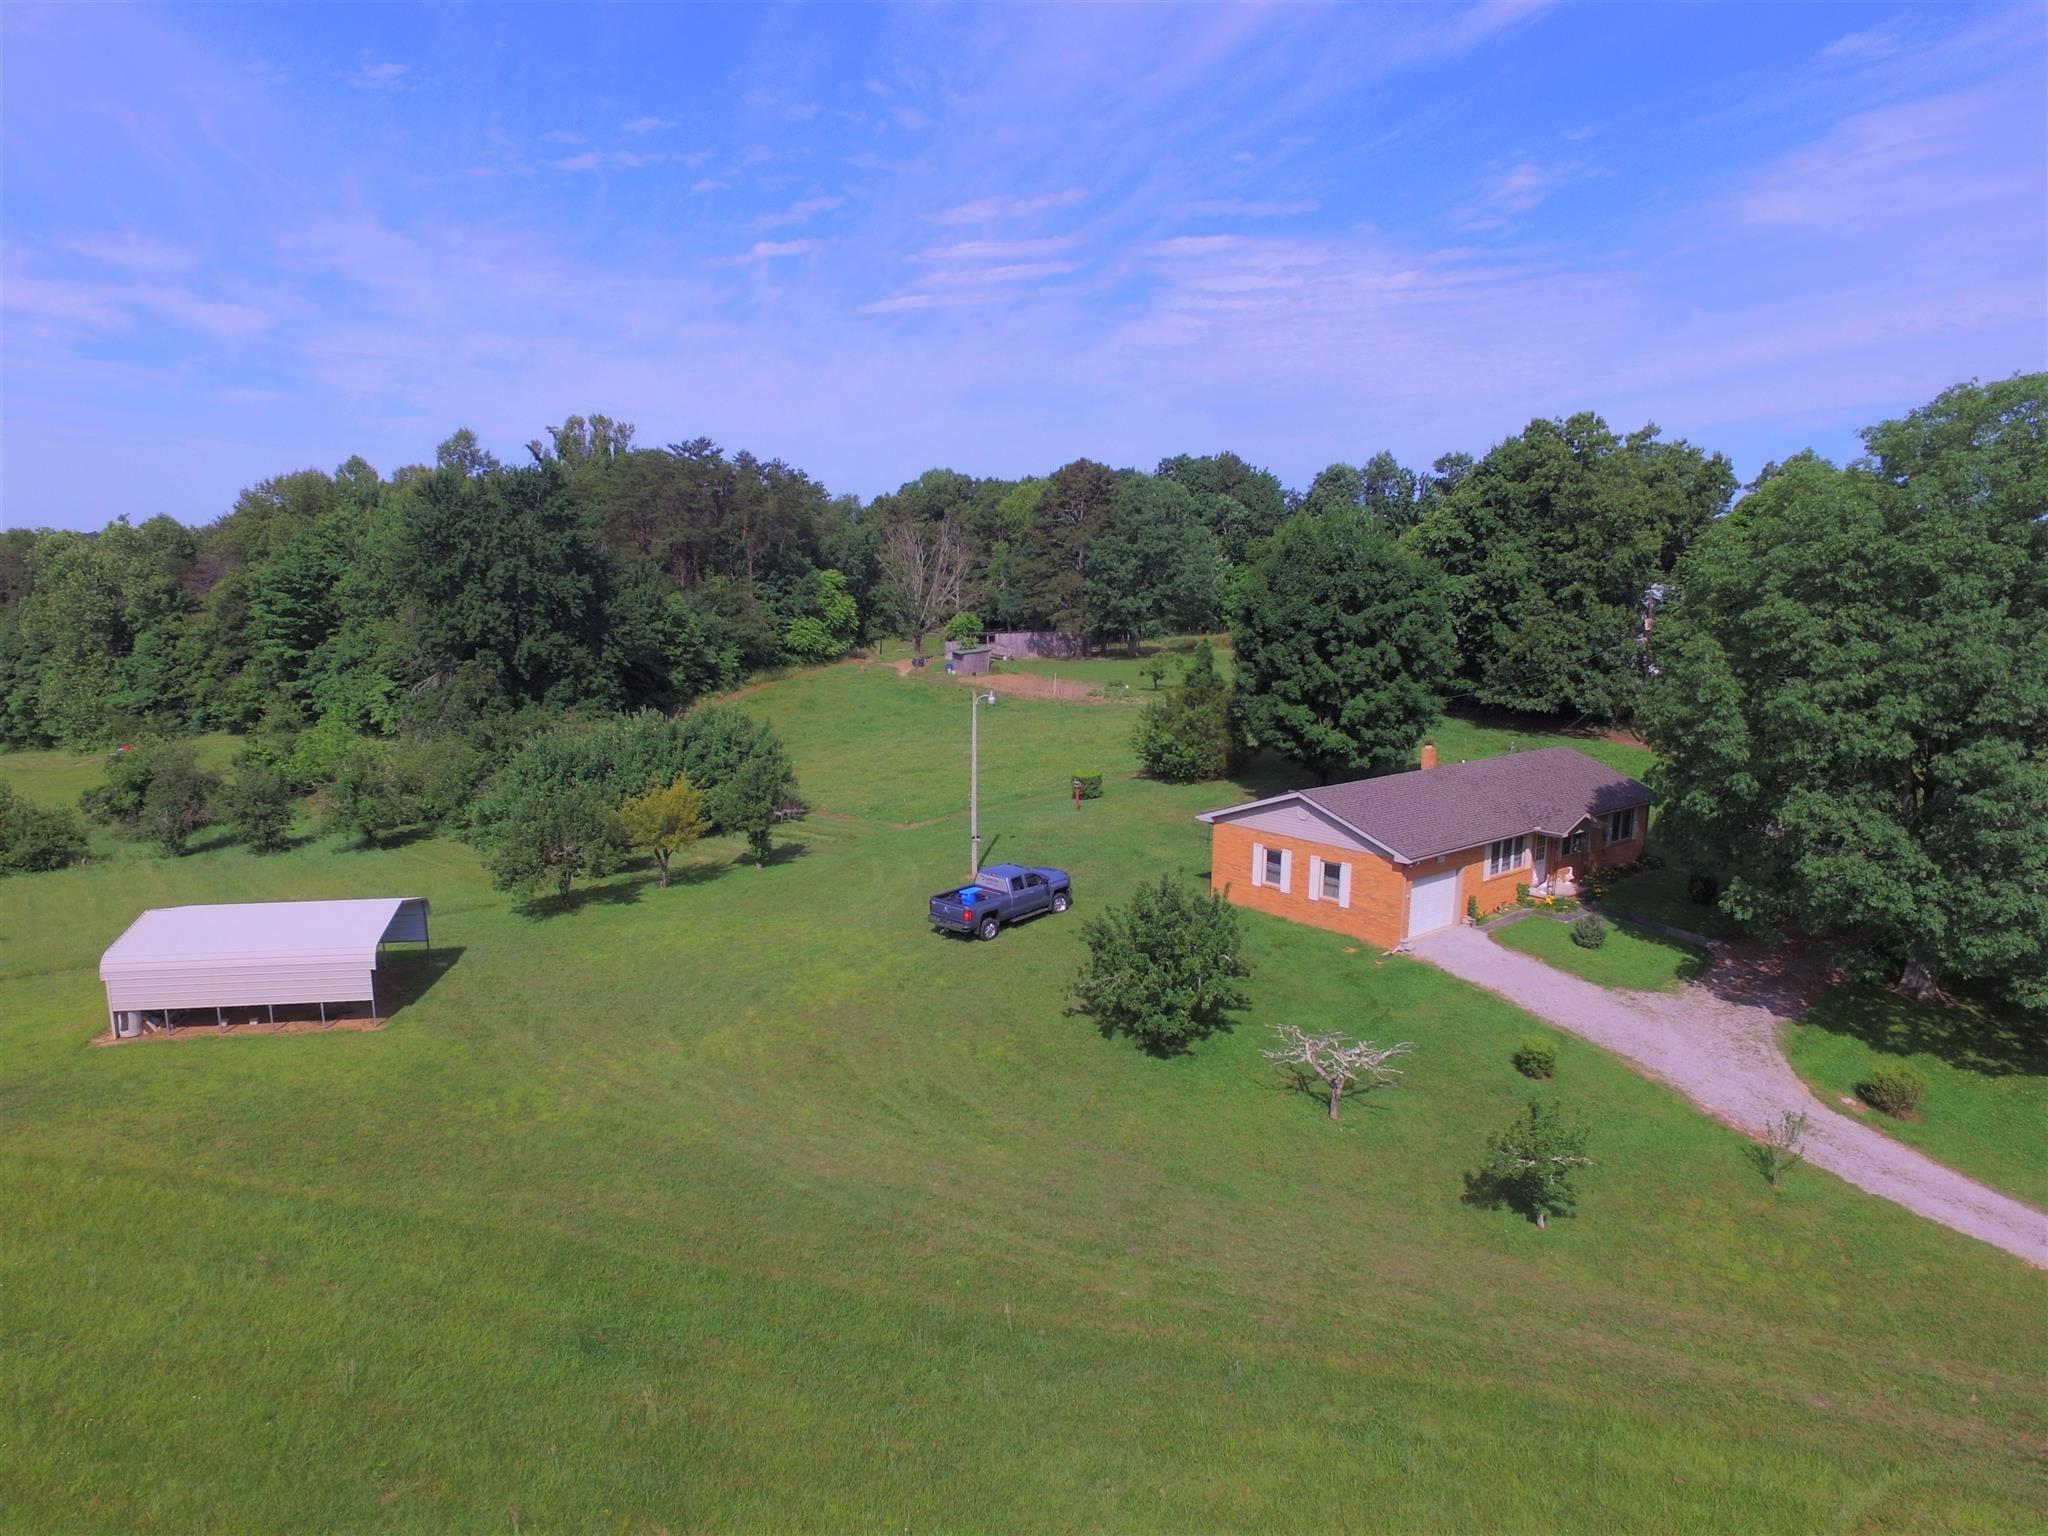 663 Farigrounds Road, Jamestown, TN 38556 - Jamestown, TN real estate listing